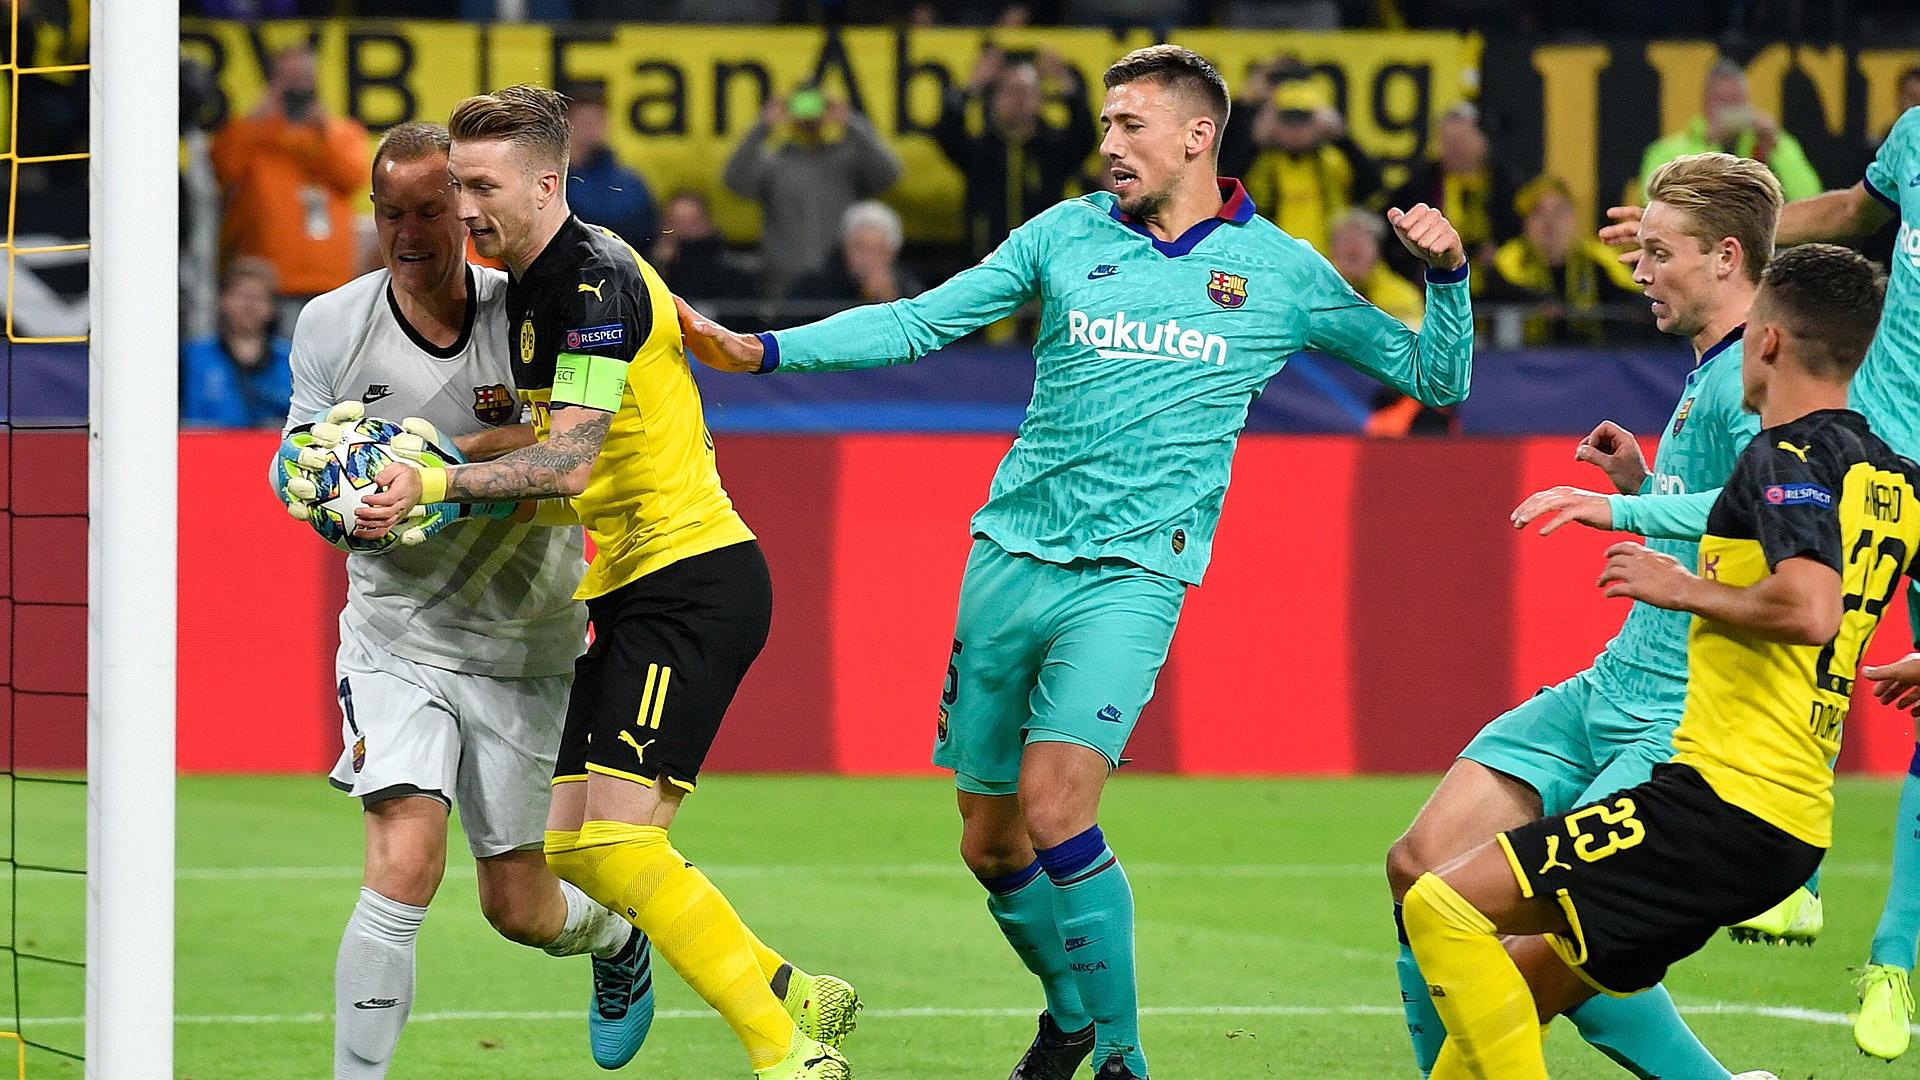 Borussia Dortmund - FC Barcelone (0-0), le film du match